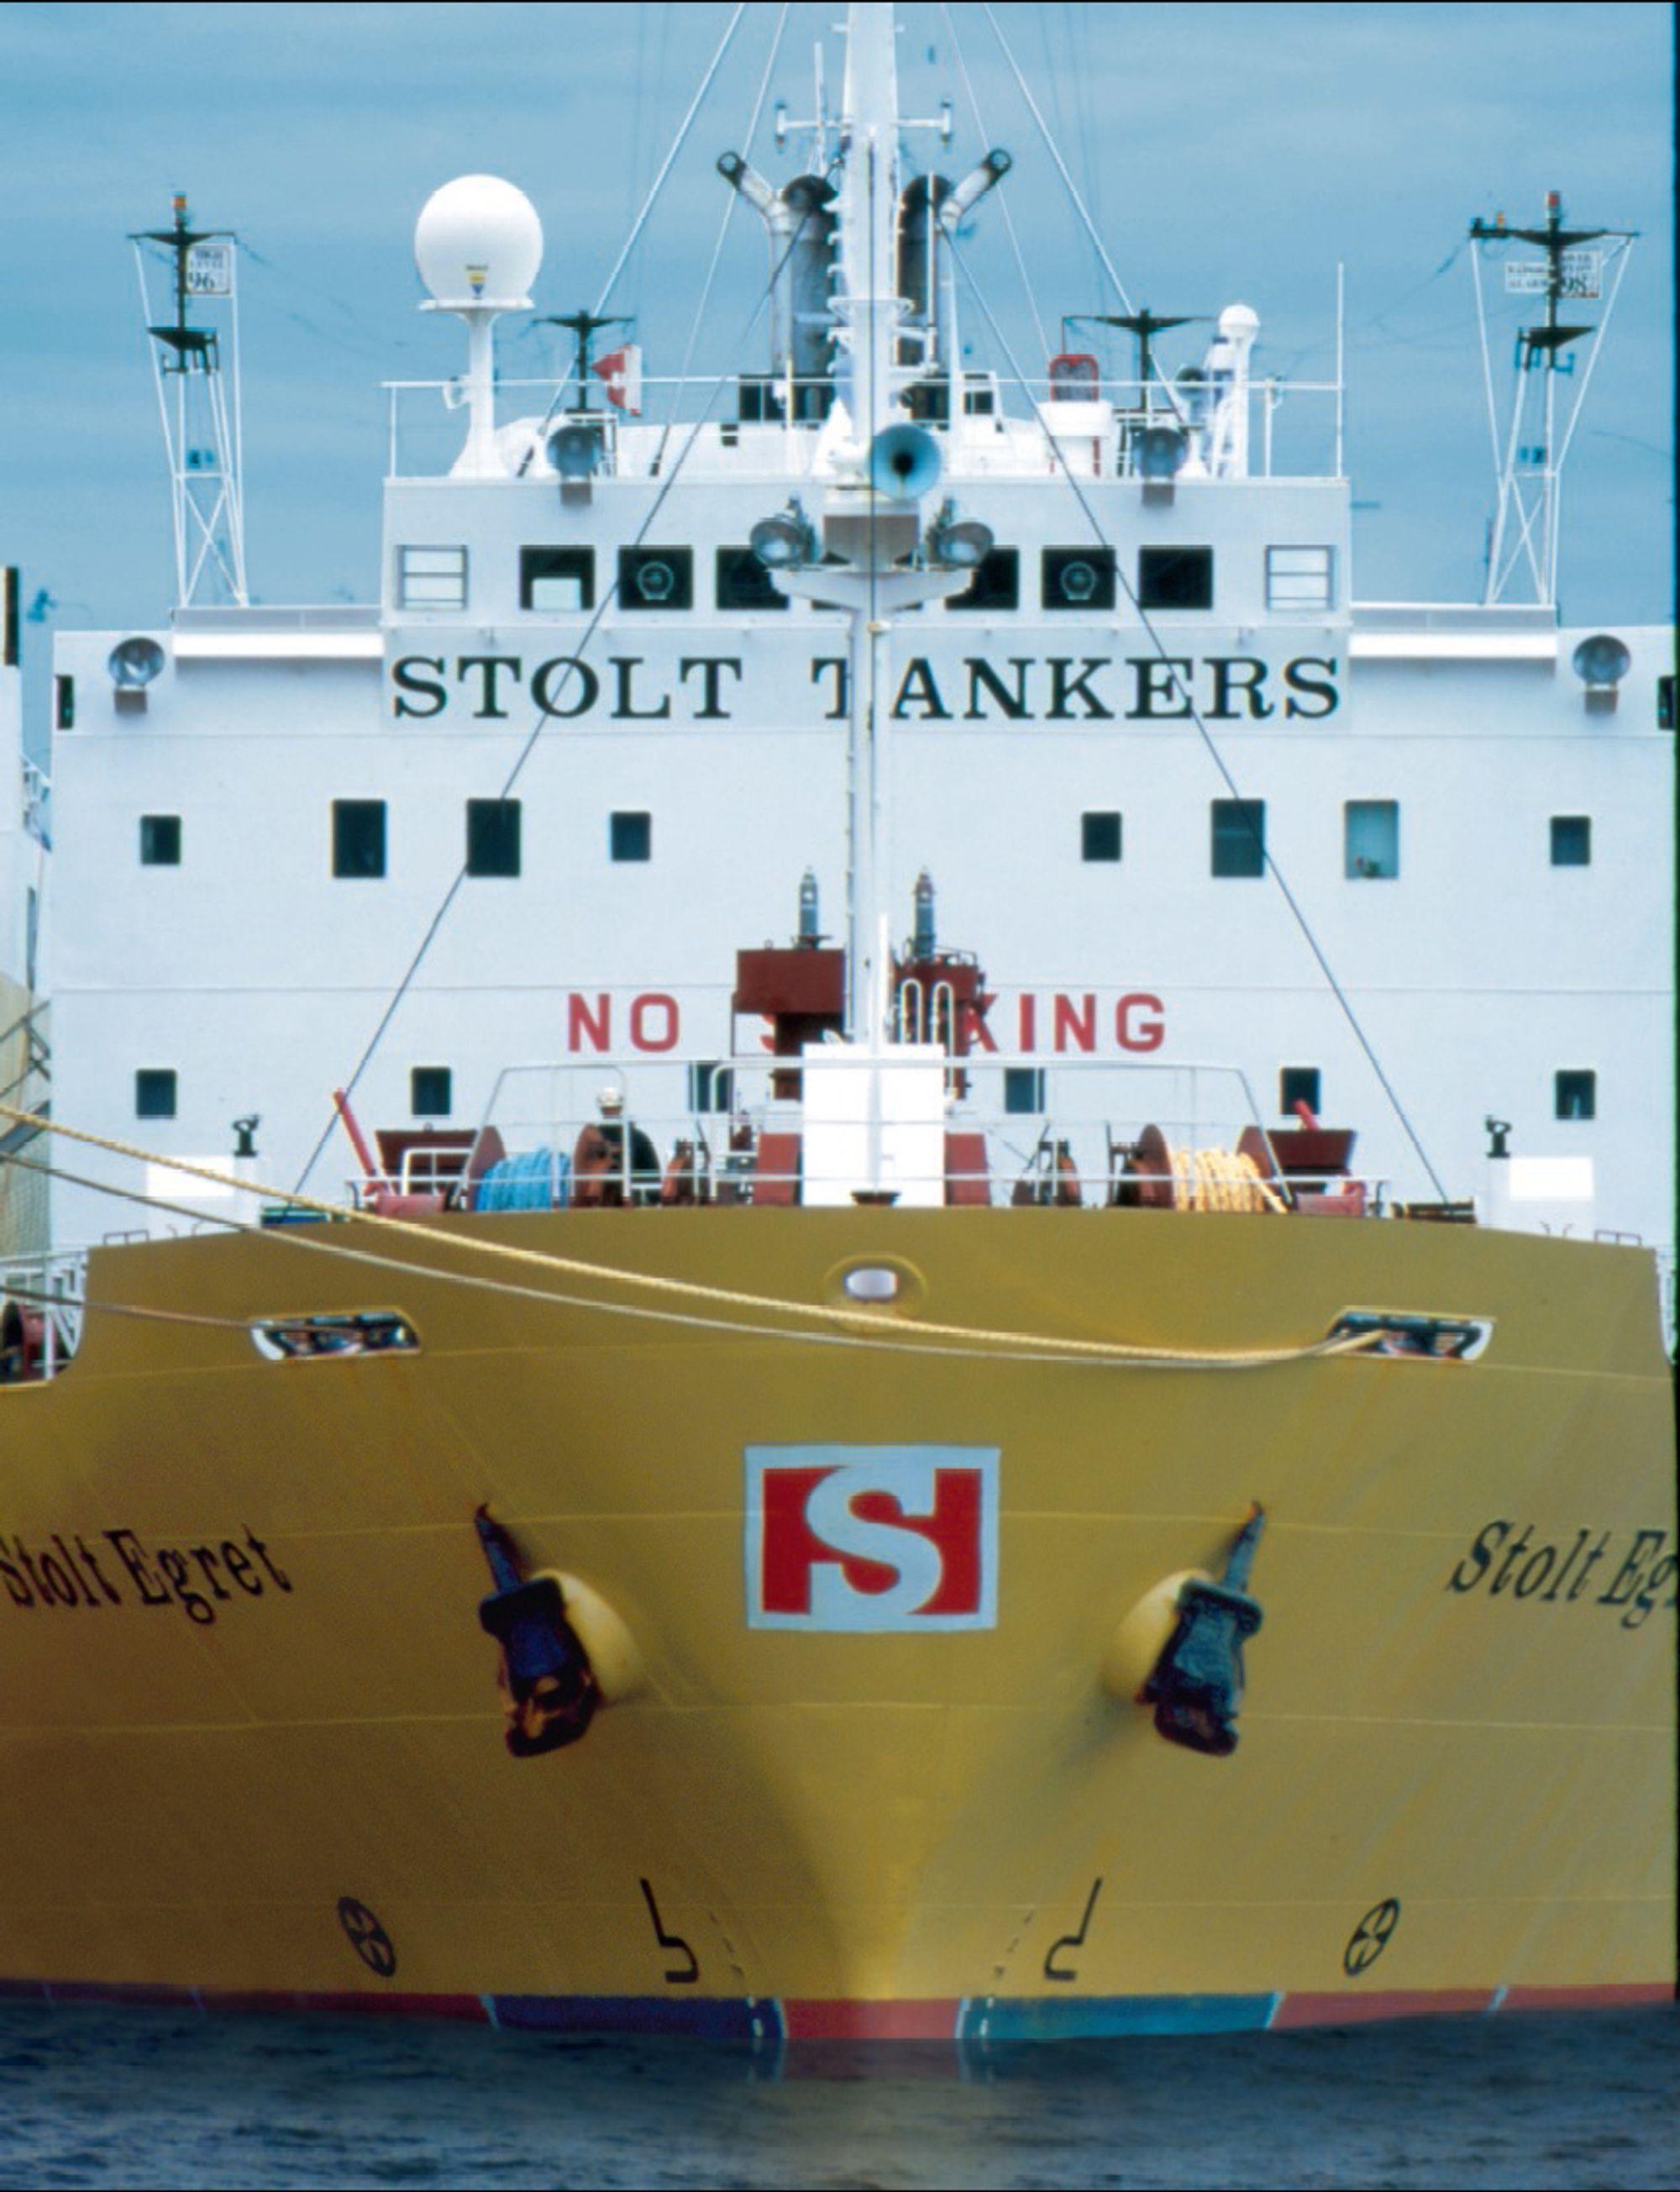 Stolt-Nielsen vurderer Norge